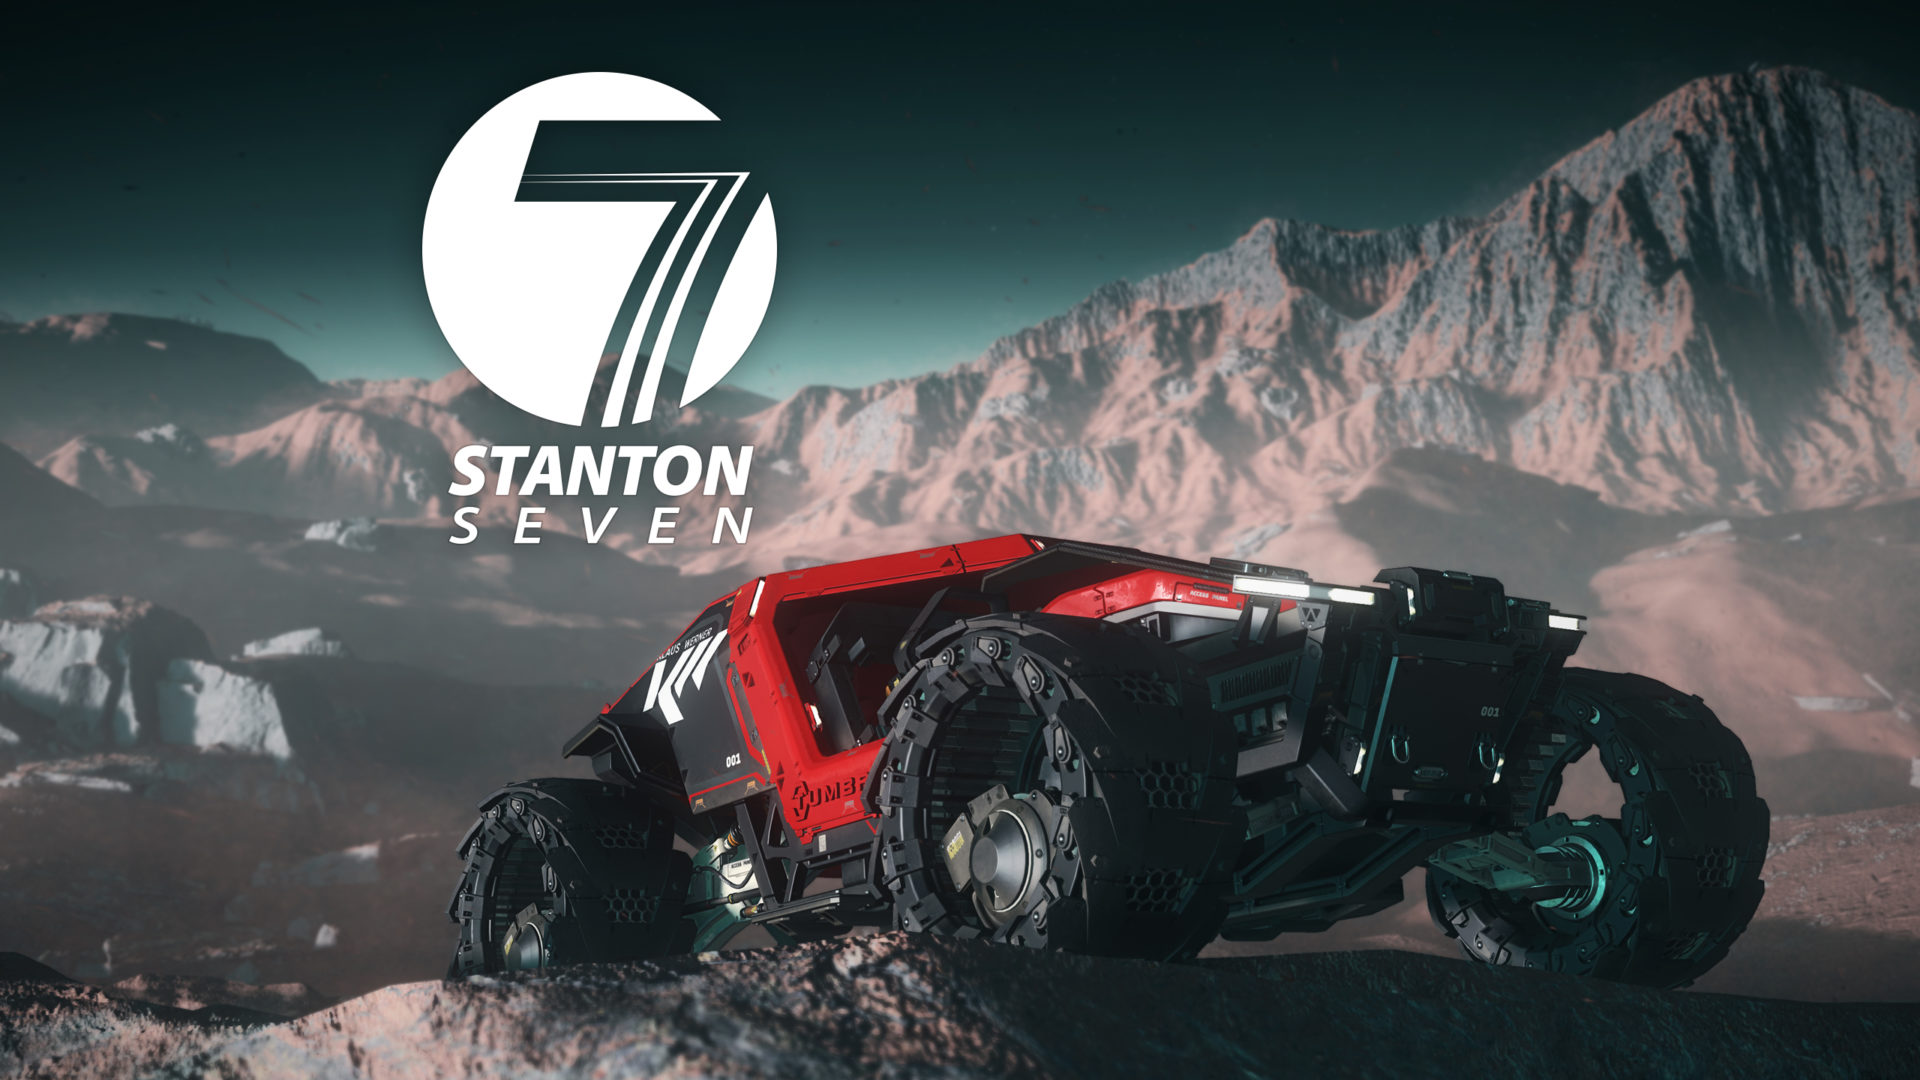 Stanton Seven Promo Video